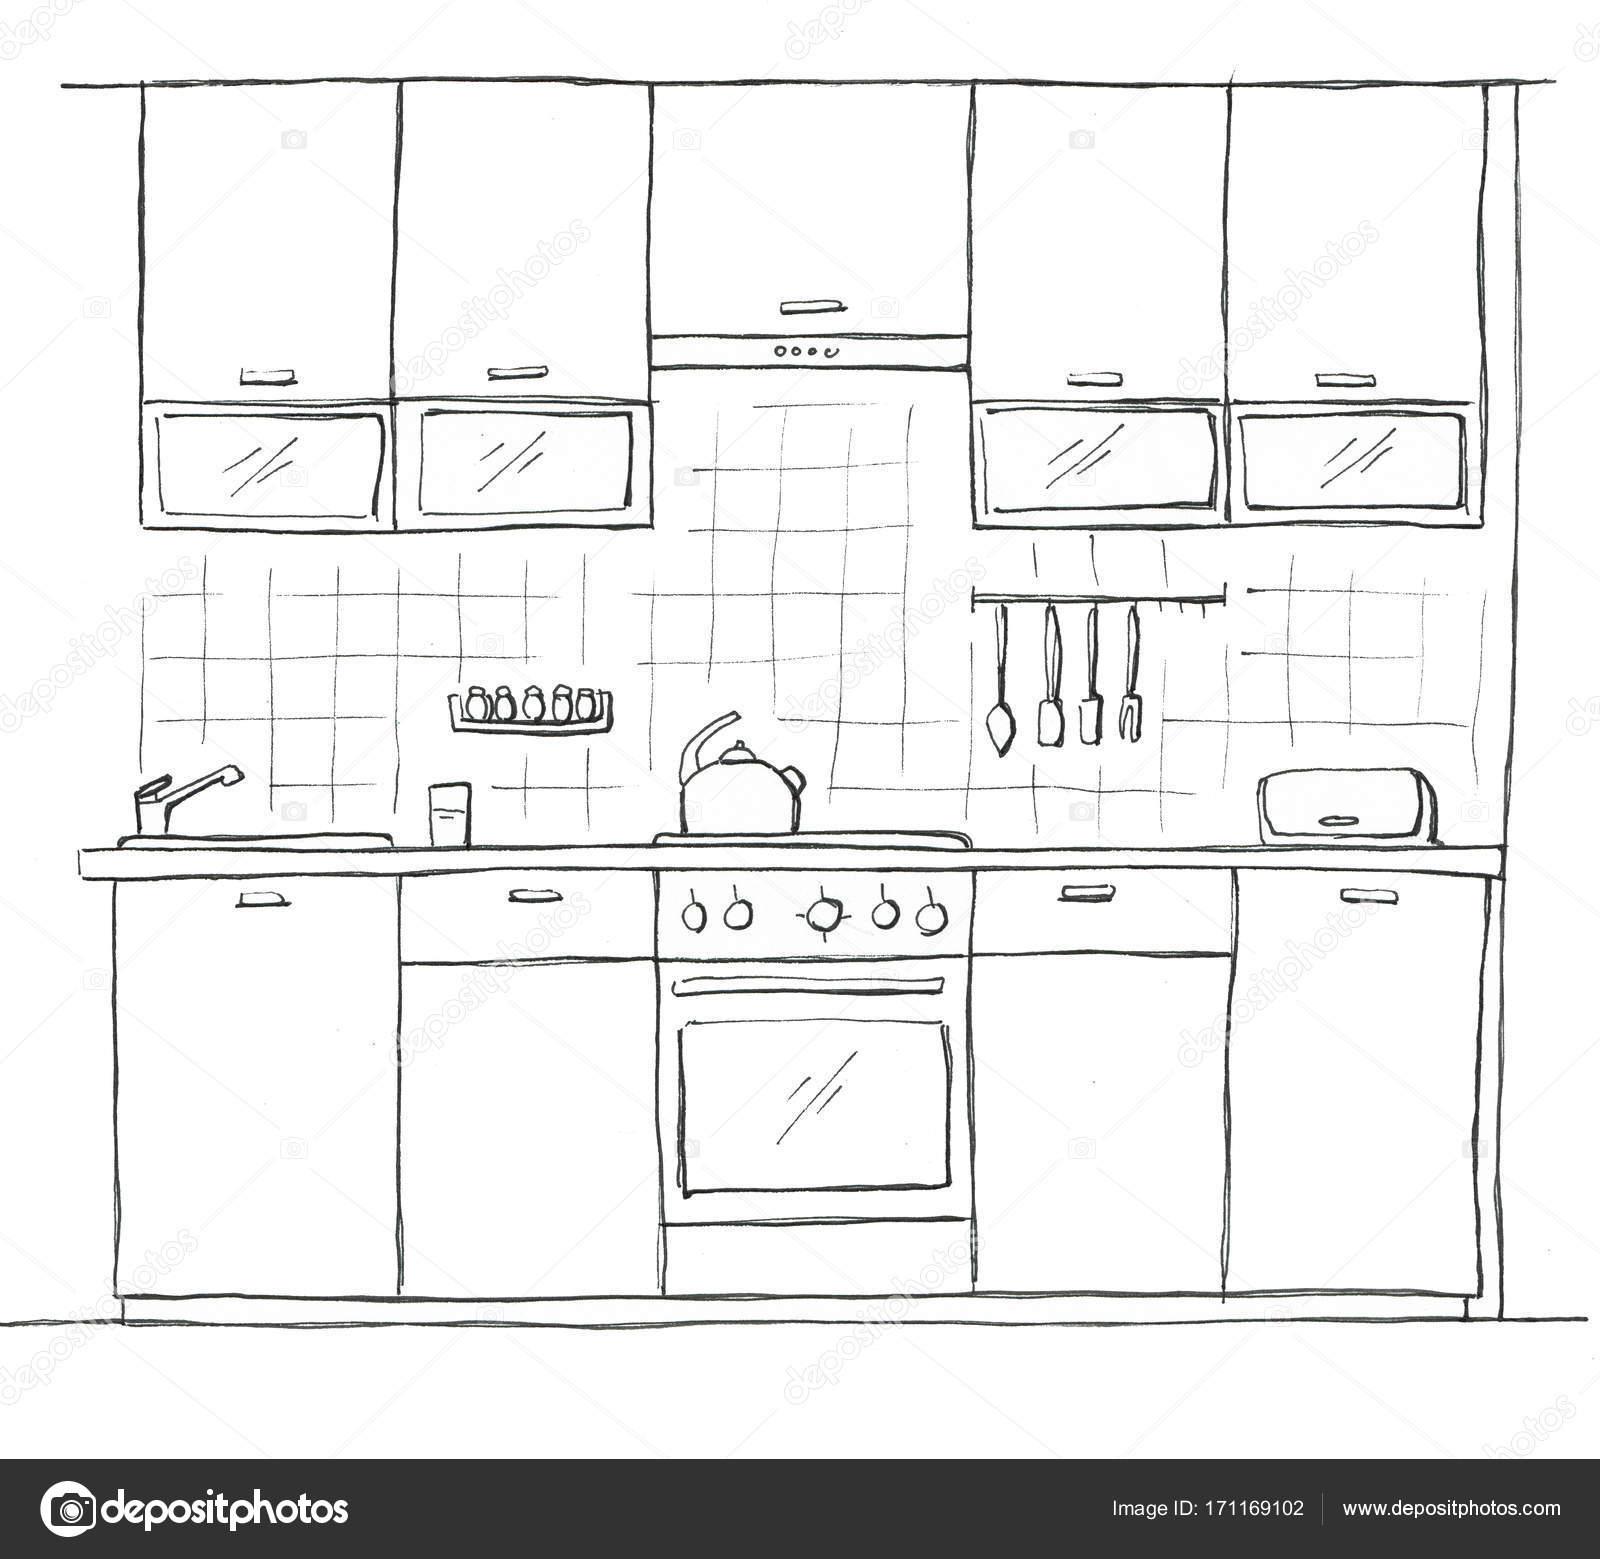 Immagini: cucina disegnata | Mobili cucina disegnata a mano ...